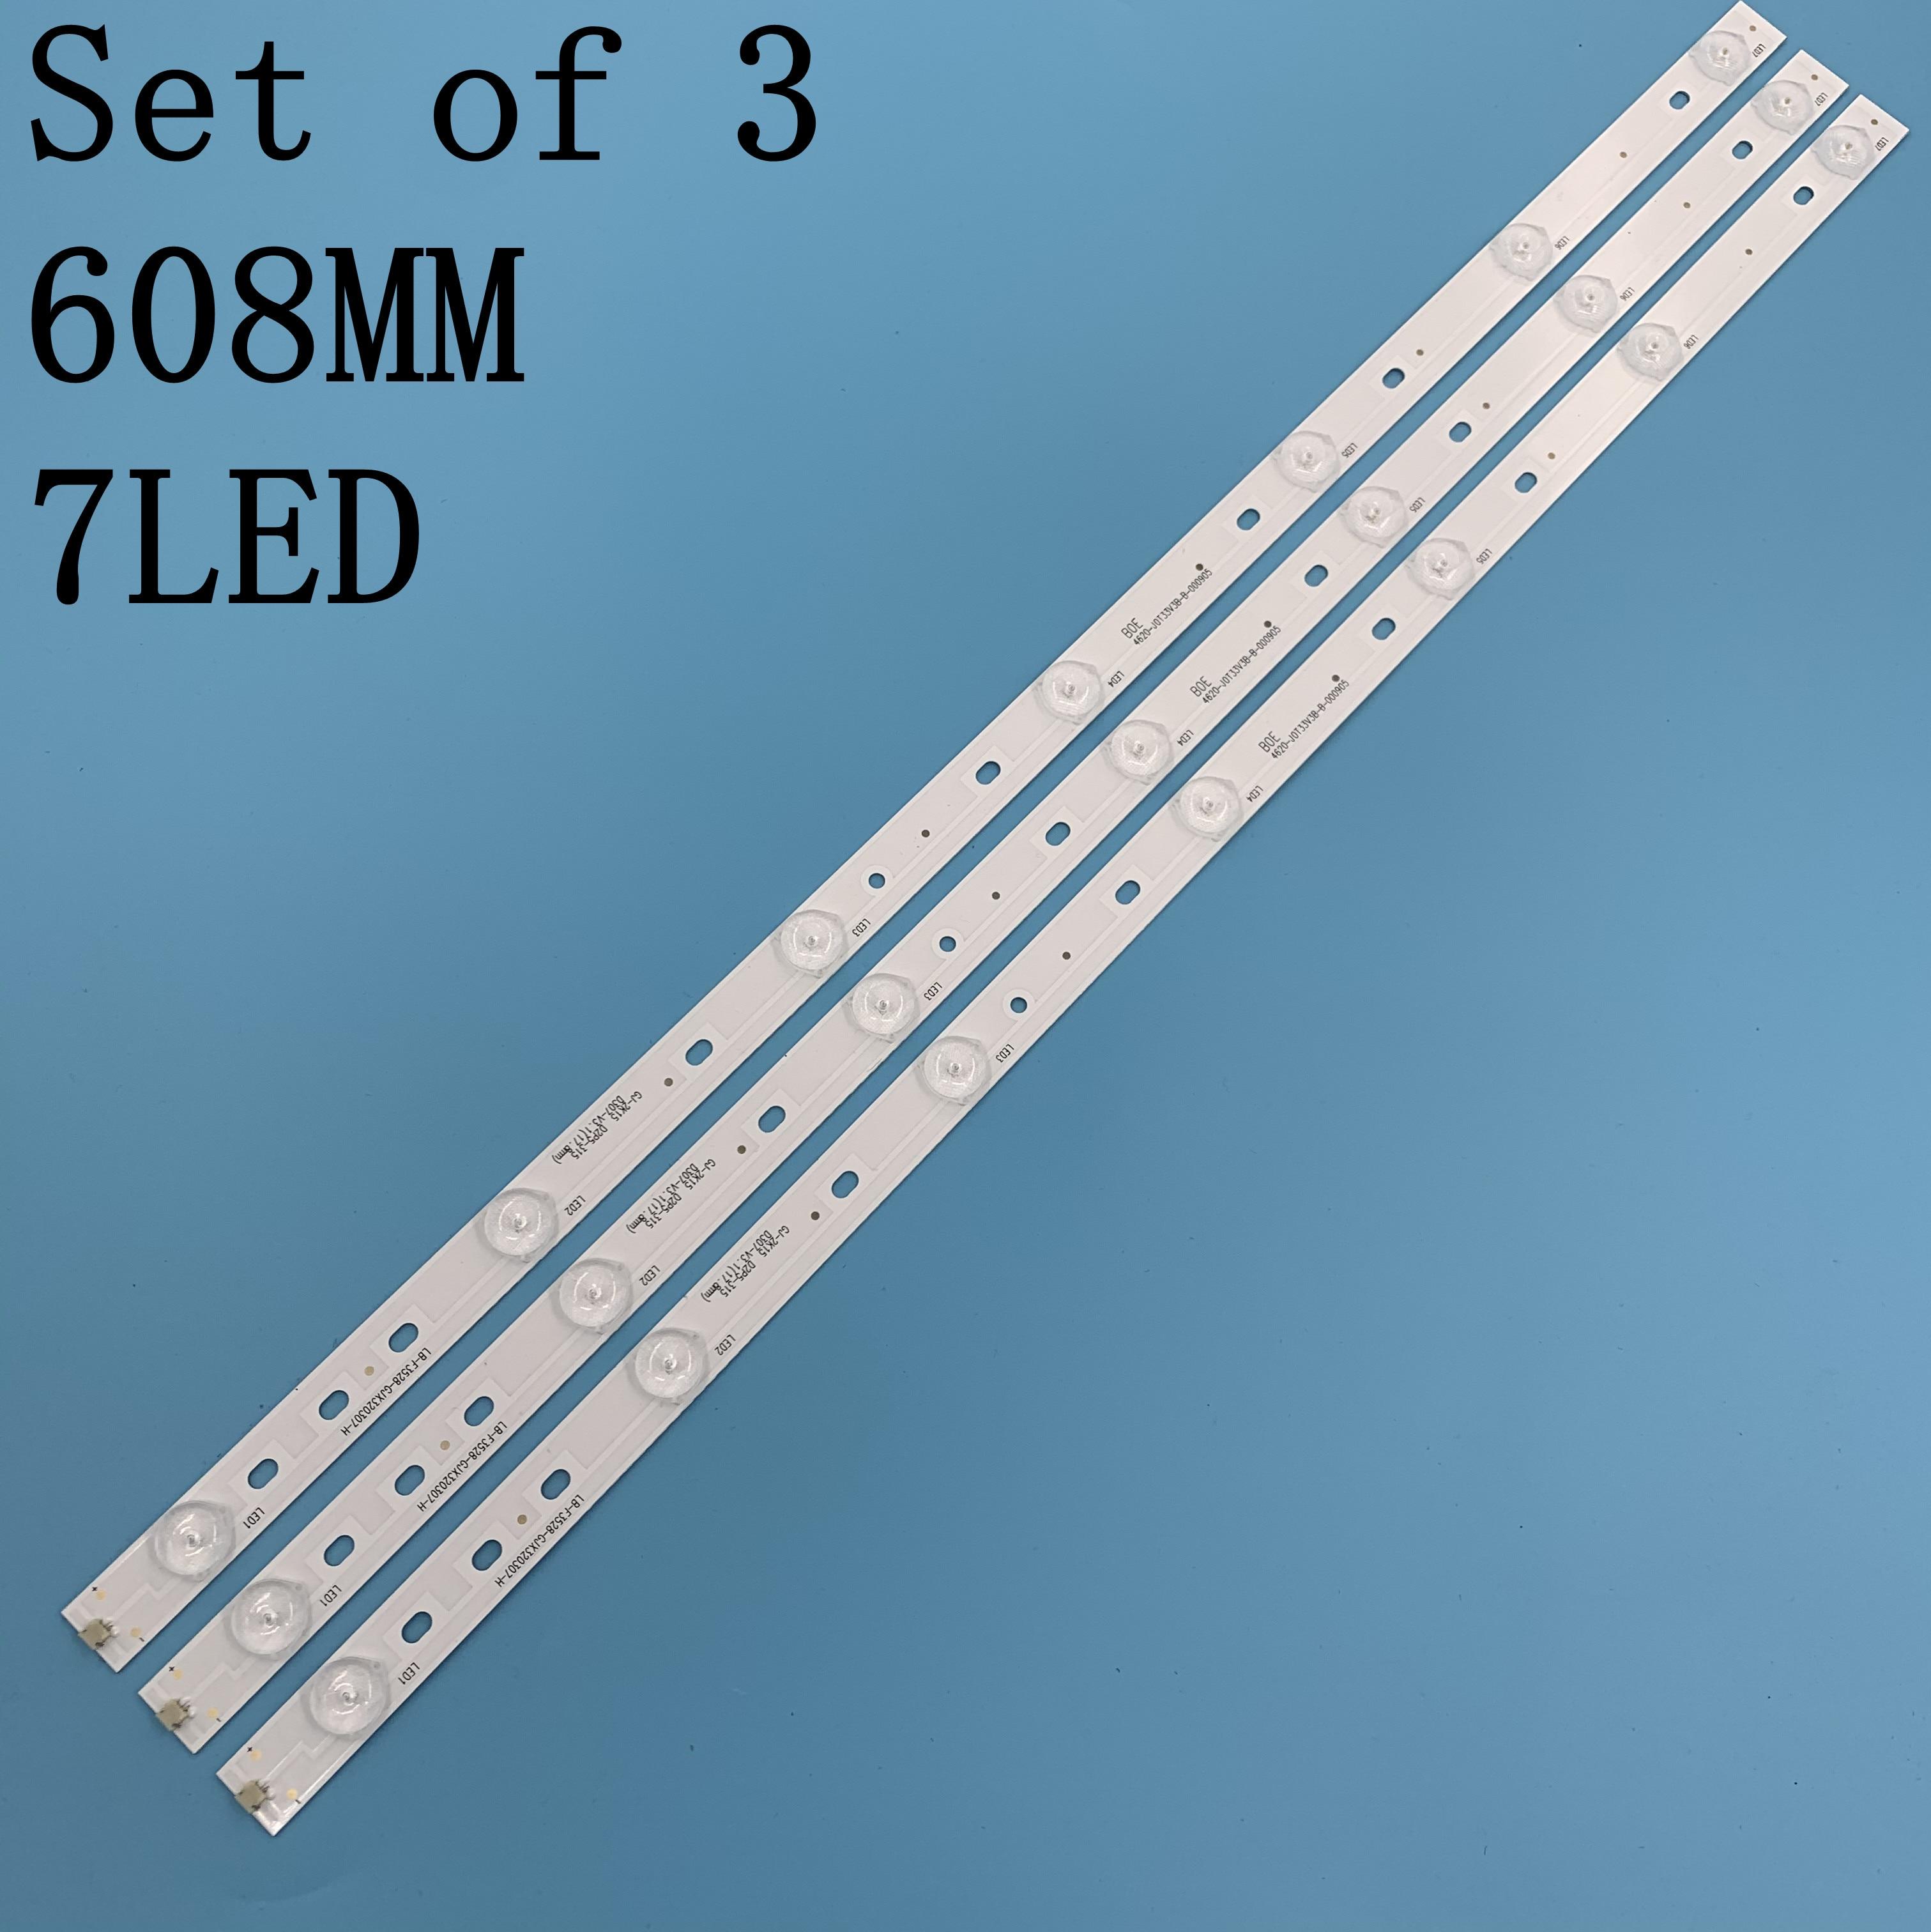 Led Bar Lights 1set=3pcs LBM320P0701-FC-2 LED Backlight Strips For P Hilips BDM3201F